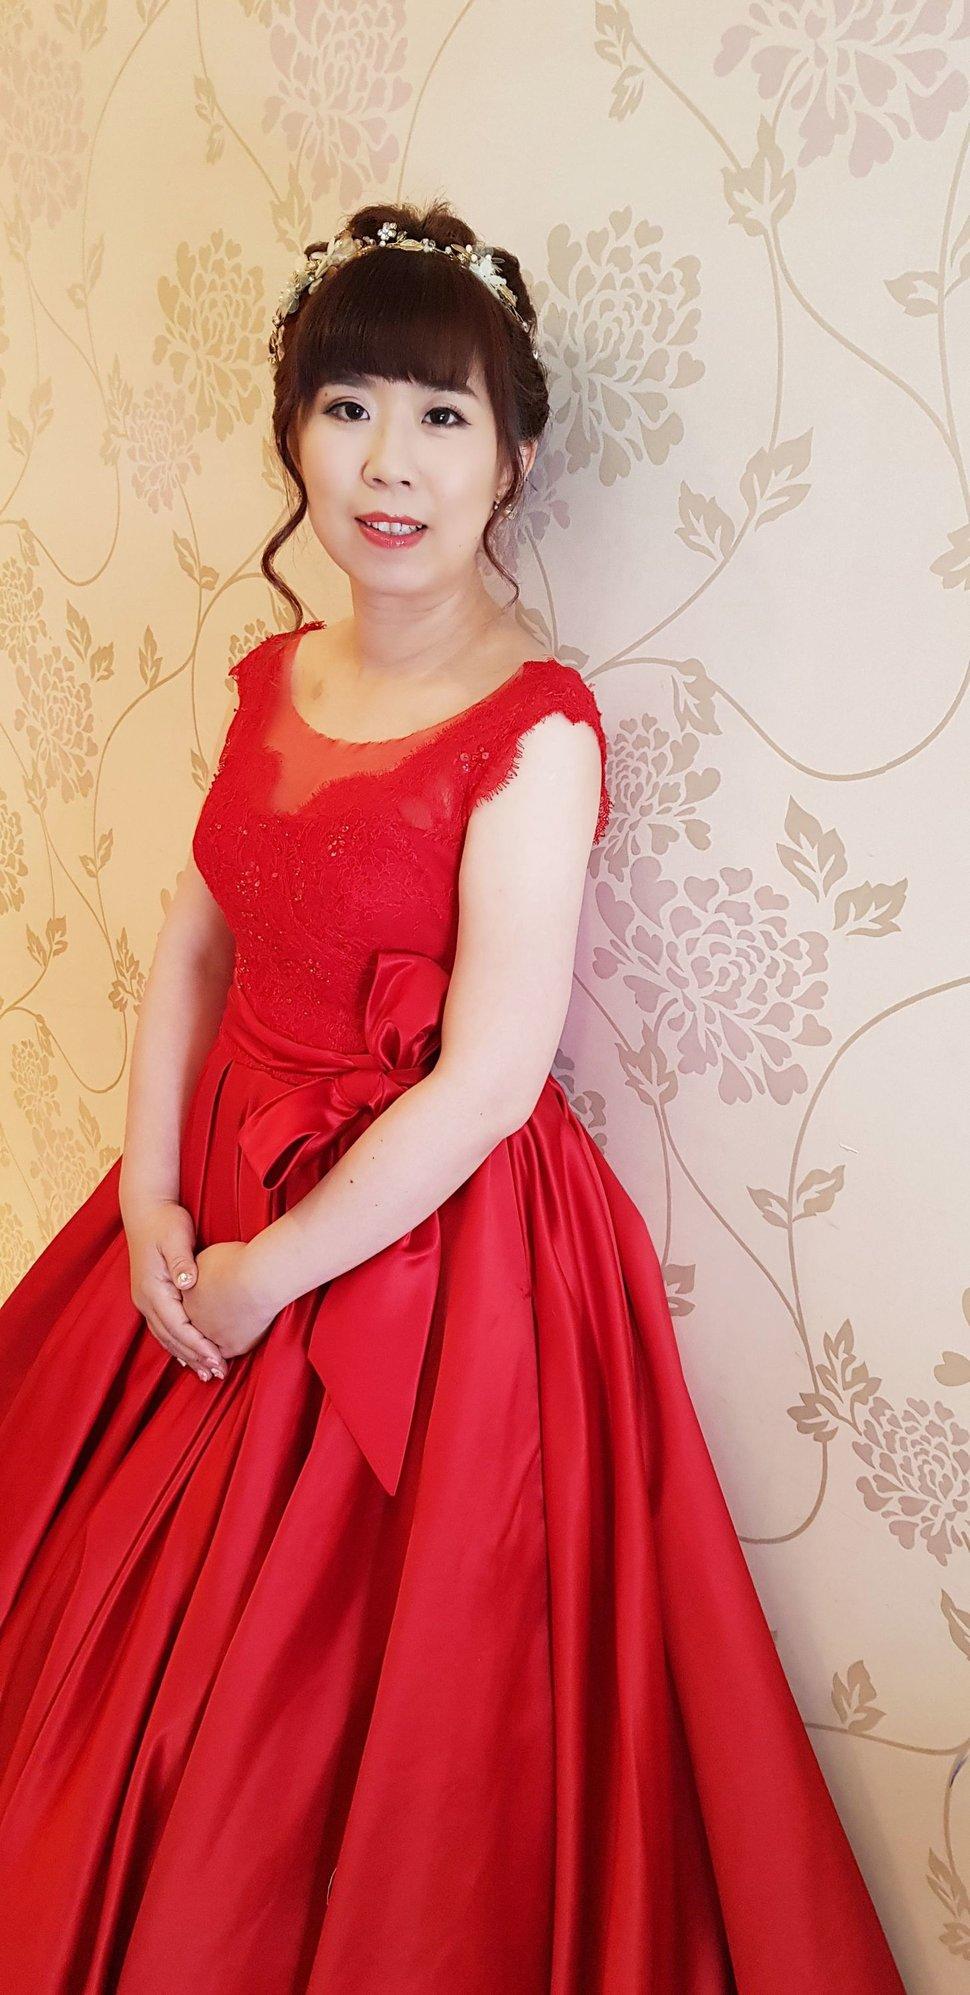 PSFix_20191012_101235 - 漾時尚婚禮整體造型總監蘇蓉蓉《結婚吧》